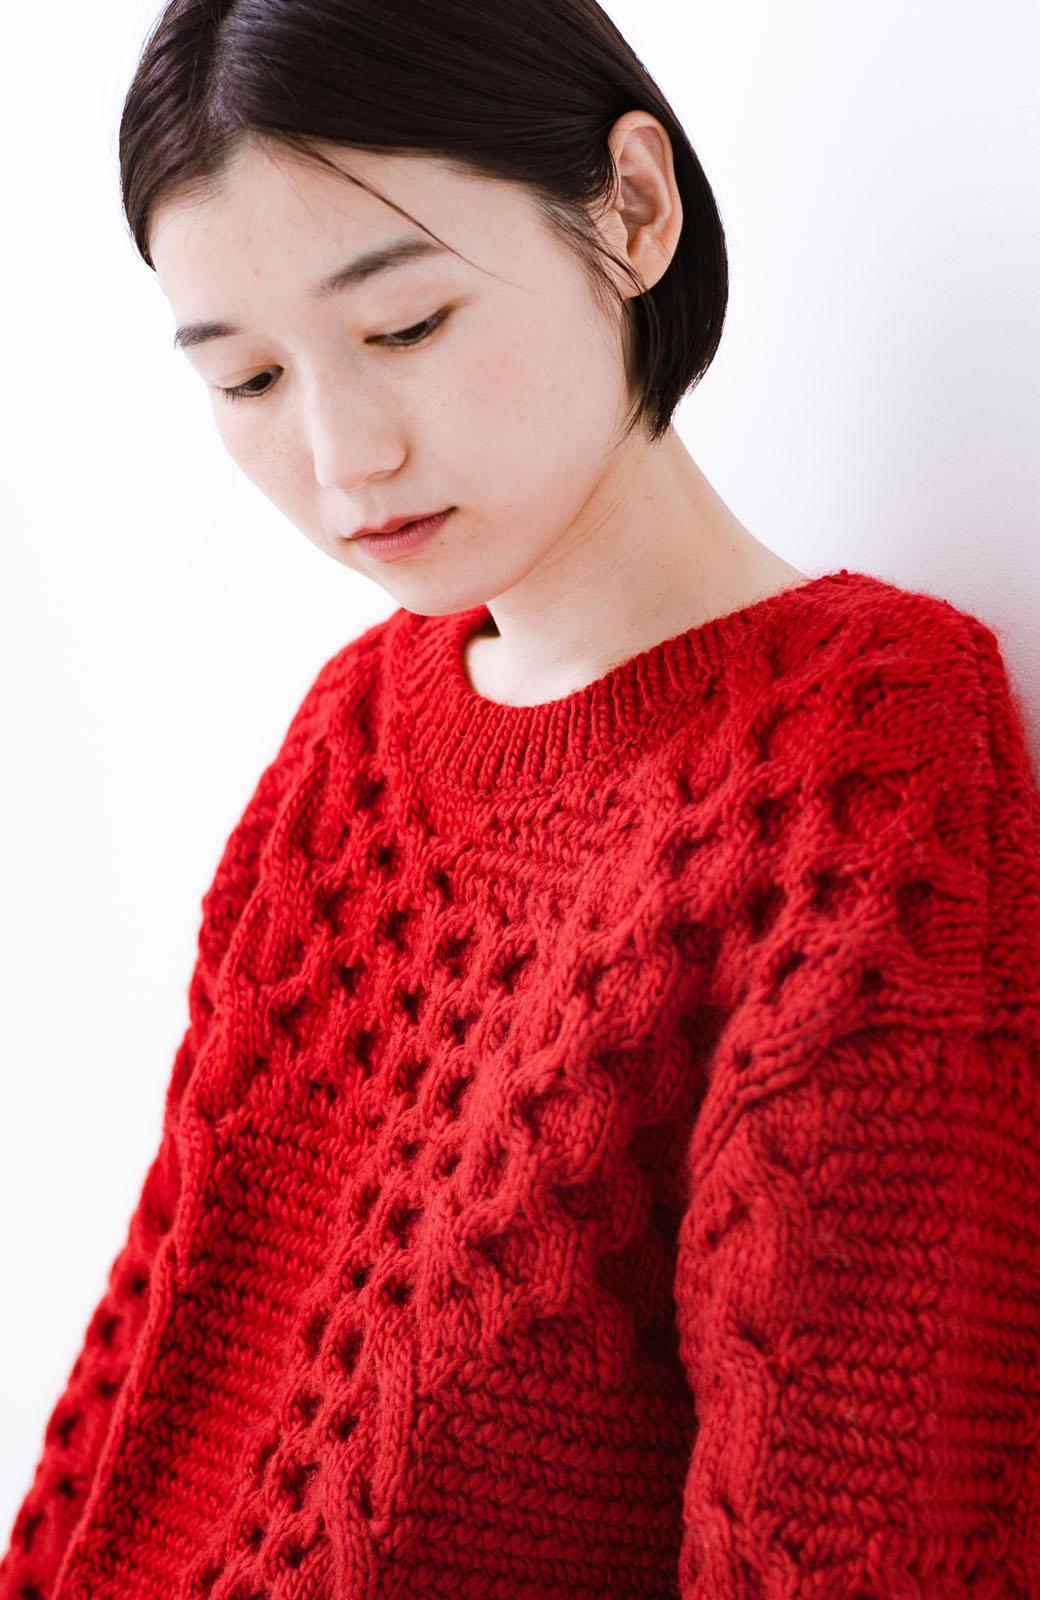 haco! 古着っぽい雰囲気がこなれたパネル編みケーブルニット <レッド>の商品写真4